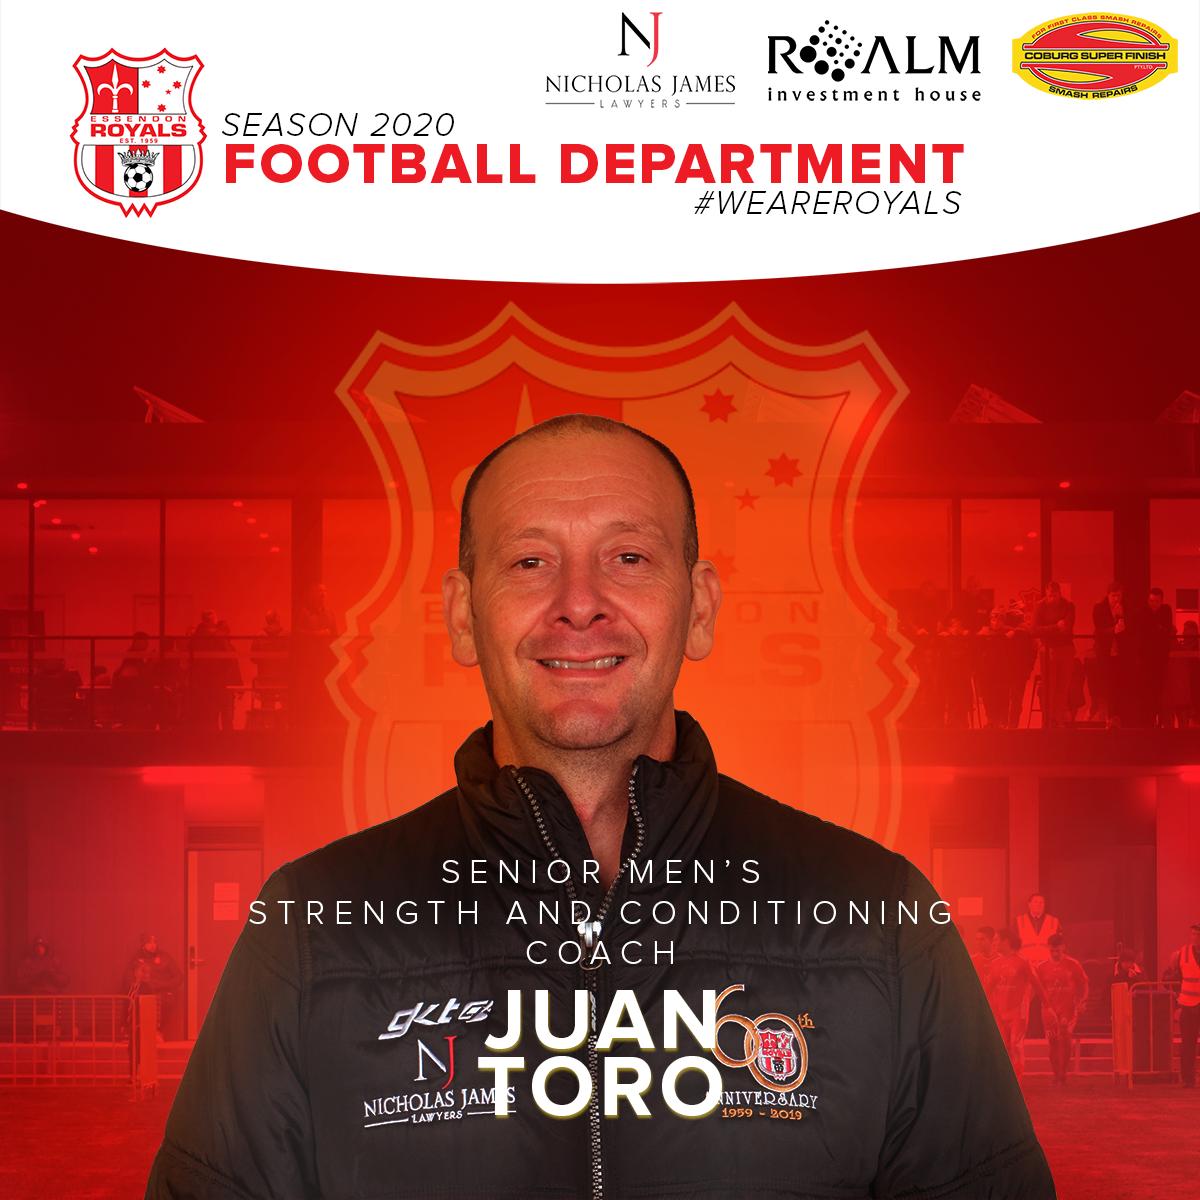 JuanToroAnnouncement.png